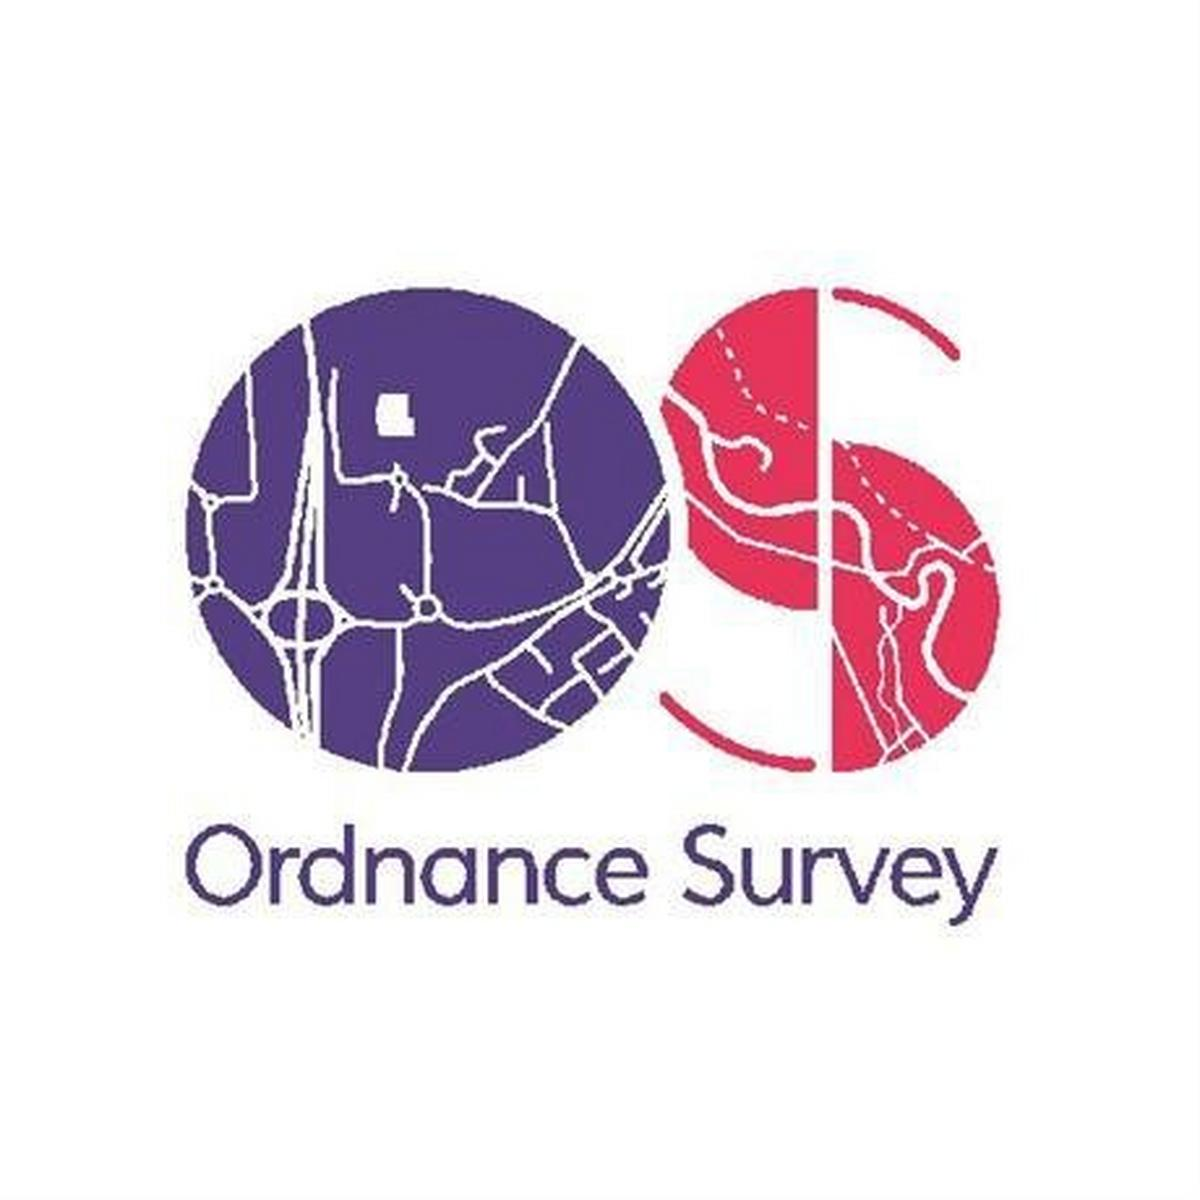 Ordnance Survey OS Landranger Map 18 Sound of Harris, North Uist, Taransay & St Kilda